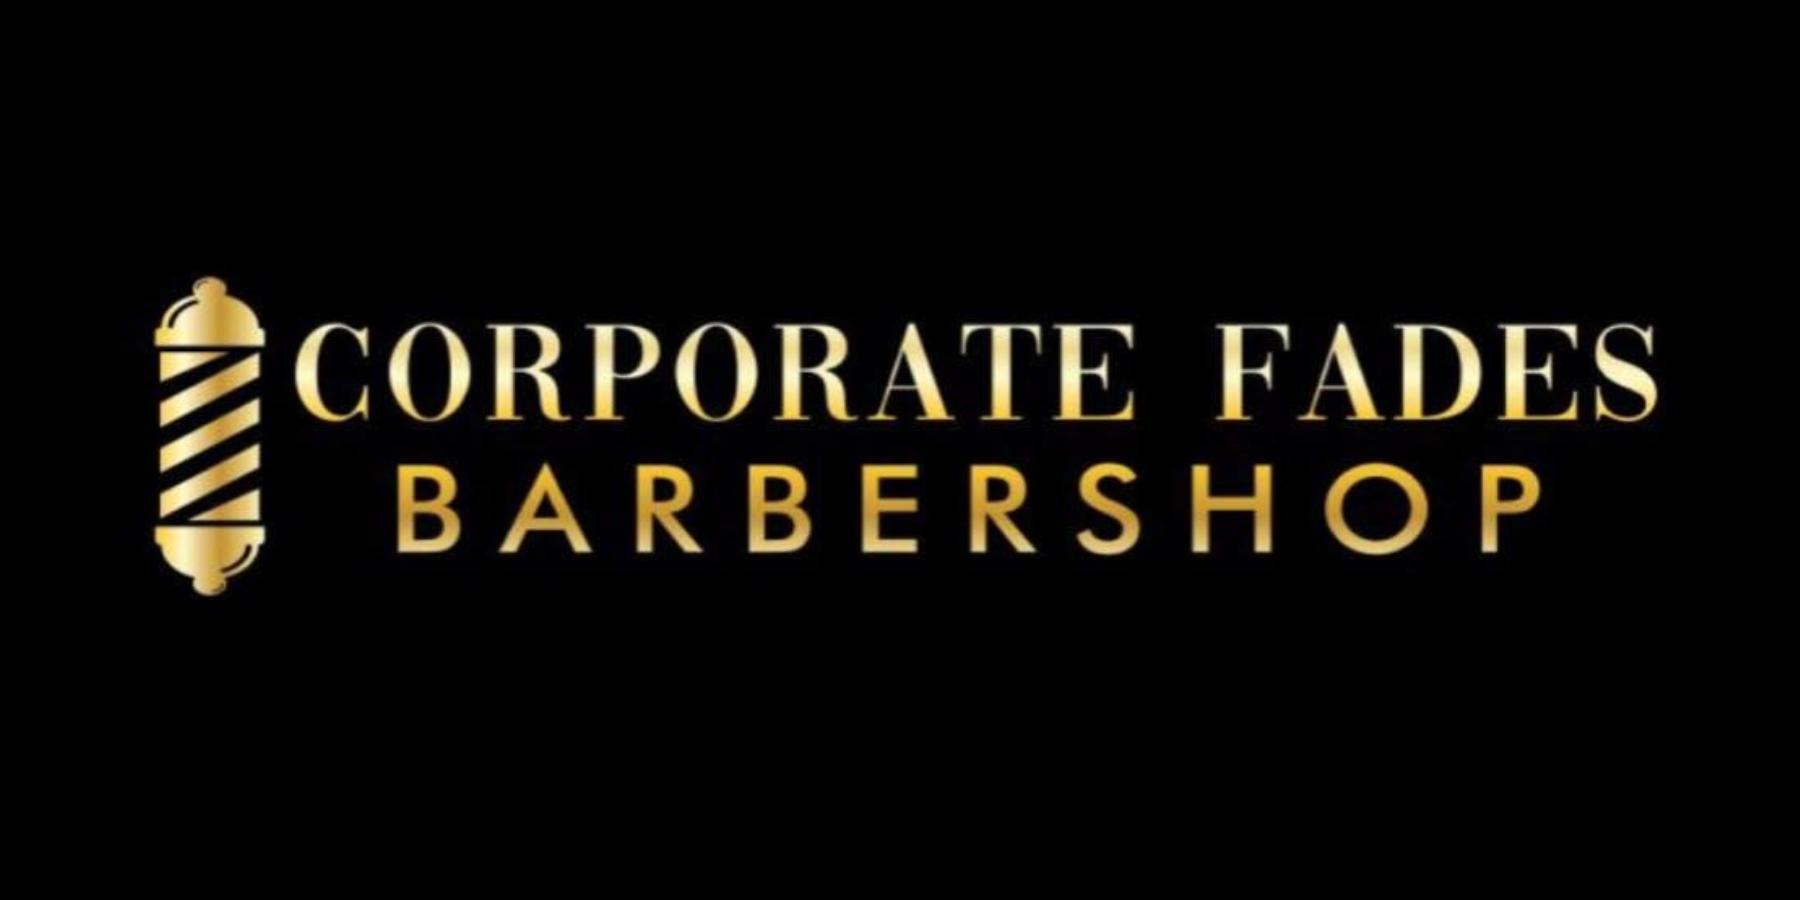 Corporate Fades Barbership